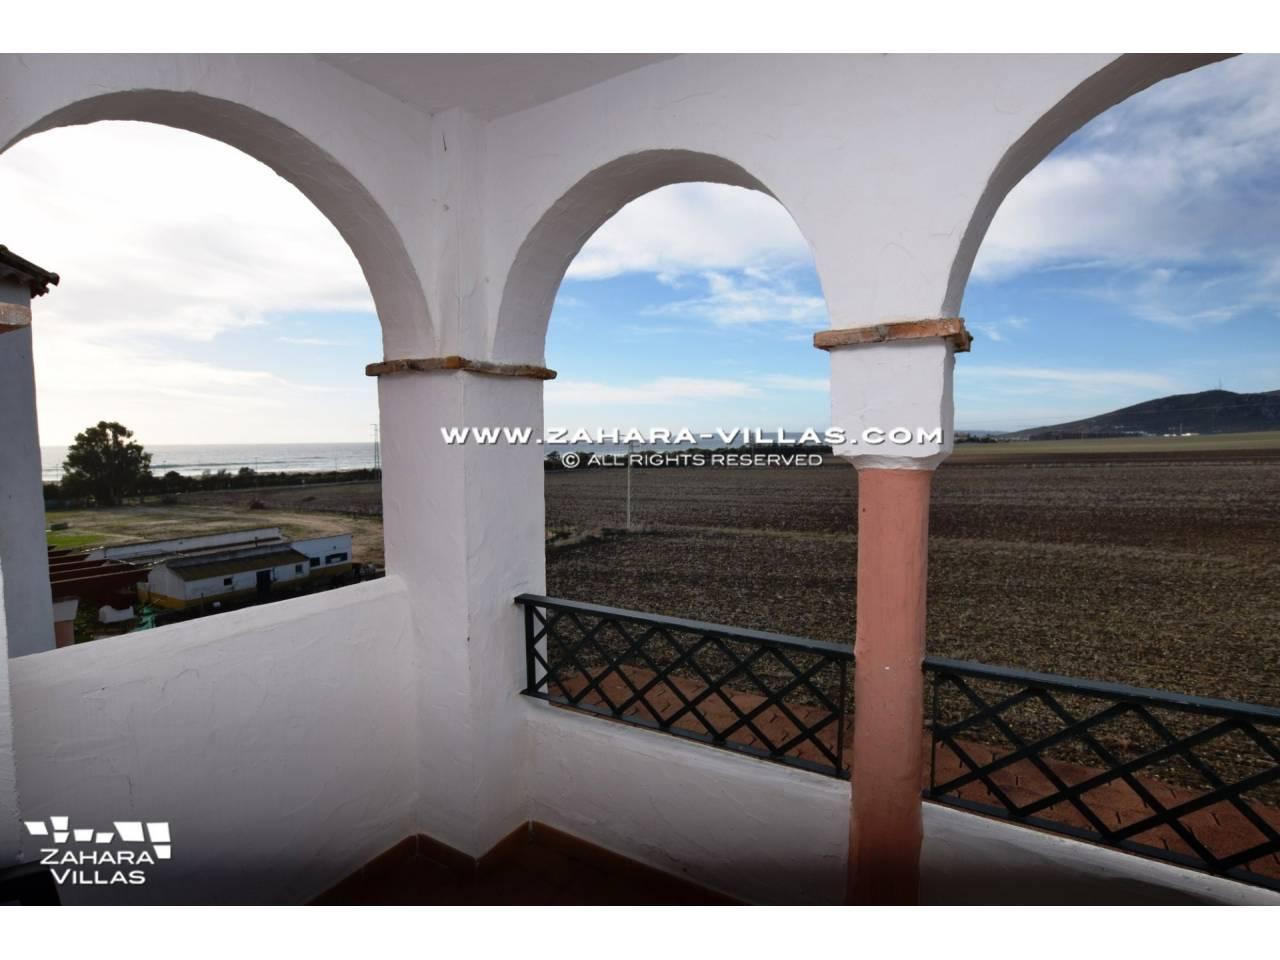 Imagen 5 de Penthouse for sale in Zahara de los Atunes